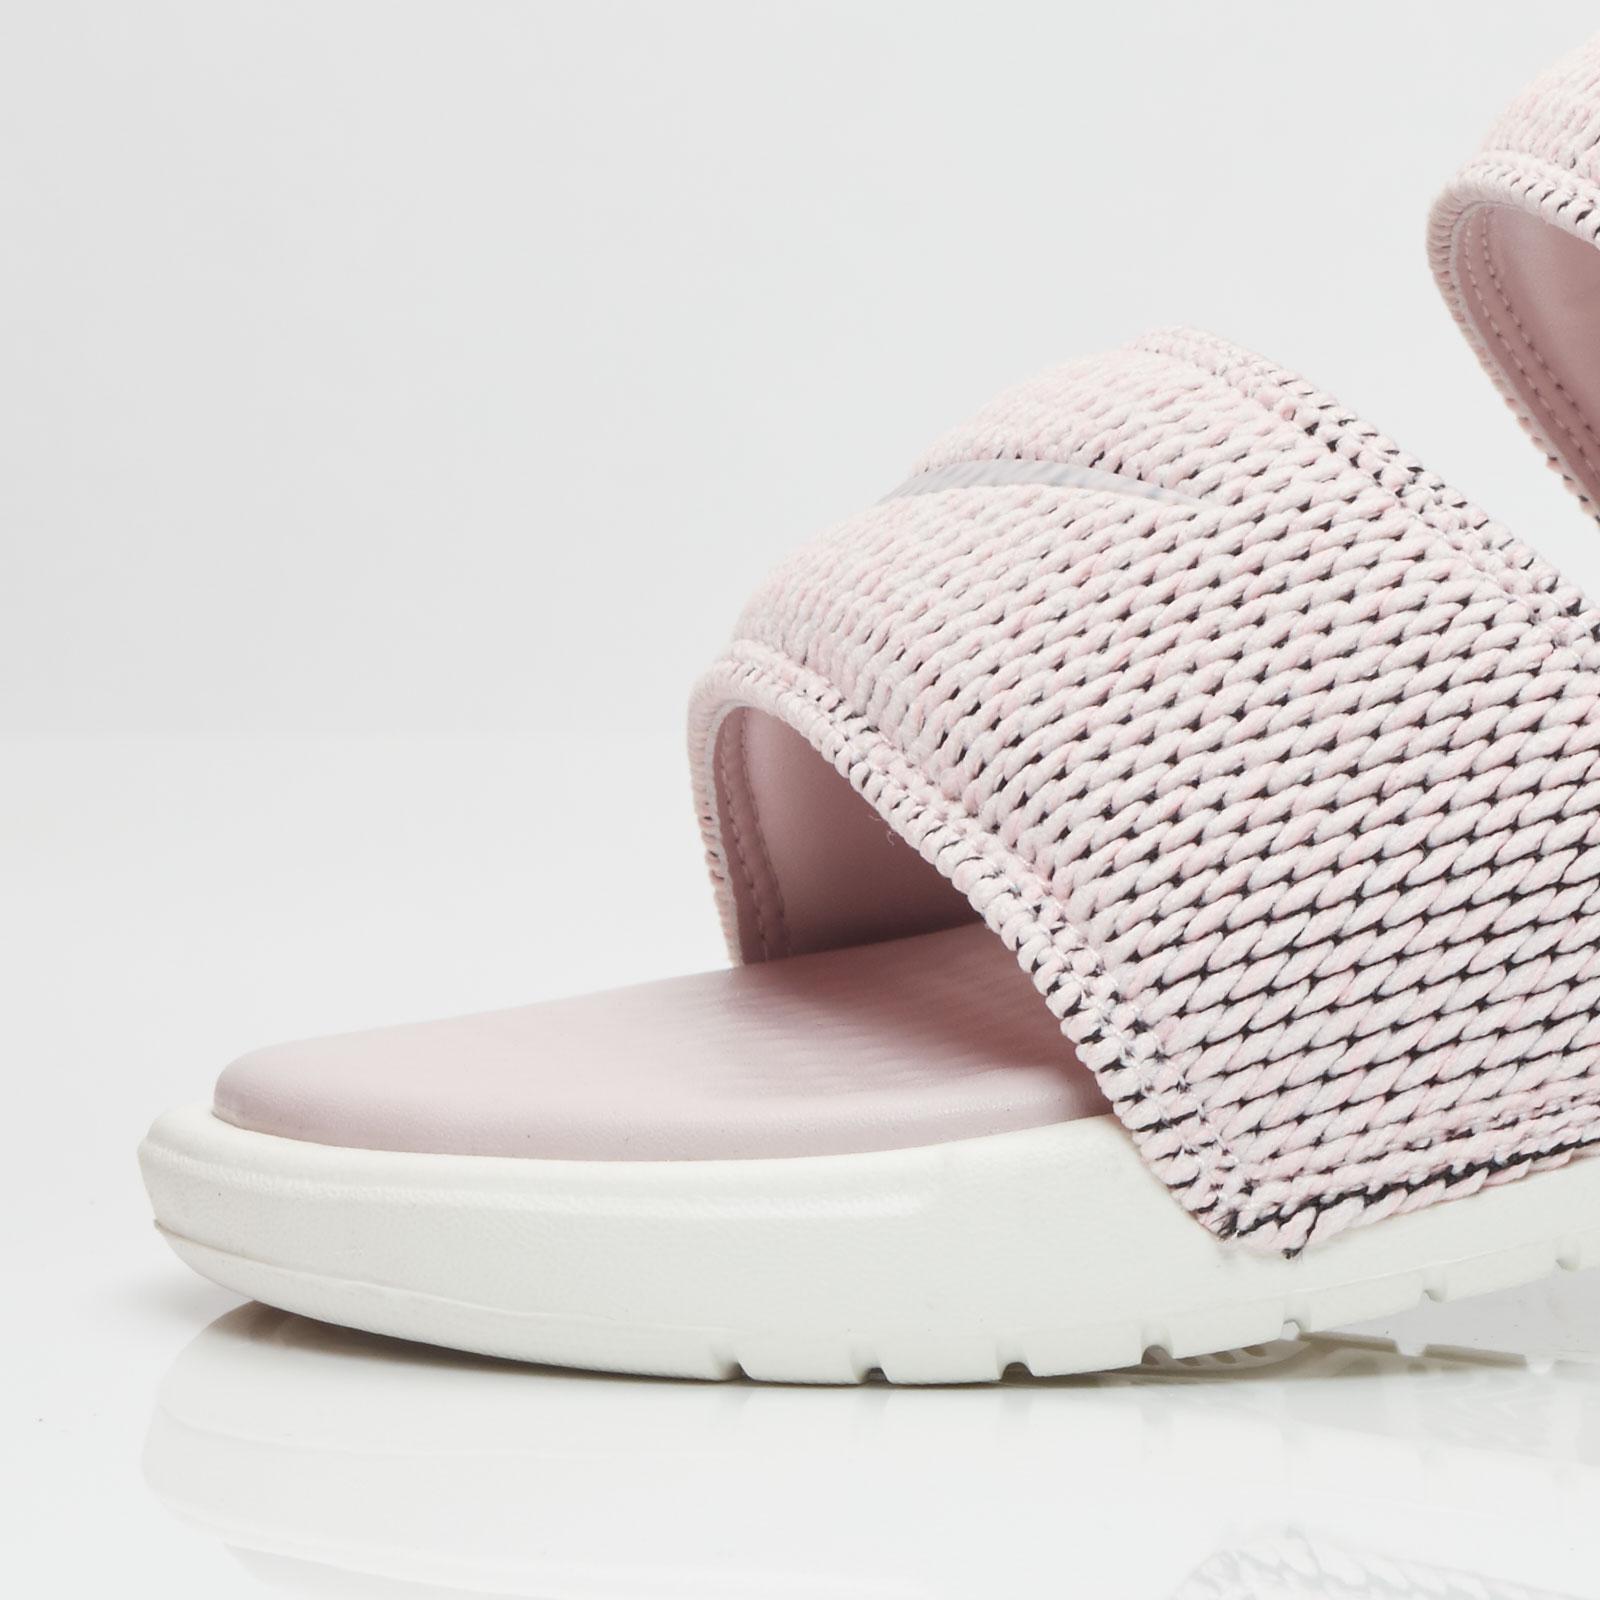 def615b4c068 Nike Benassi Duo Ultra Slide   Pigalle - 902783-600 - Sneakersnstuff ...